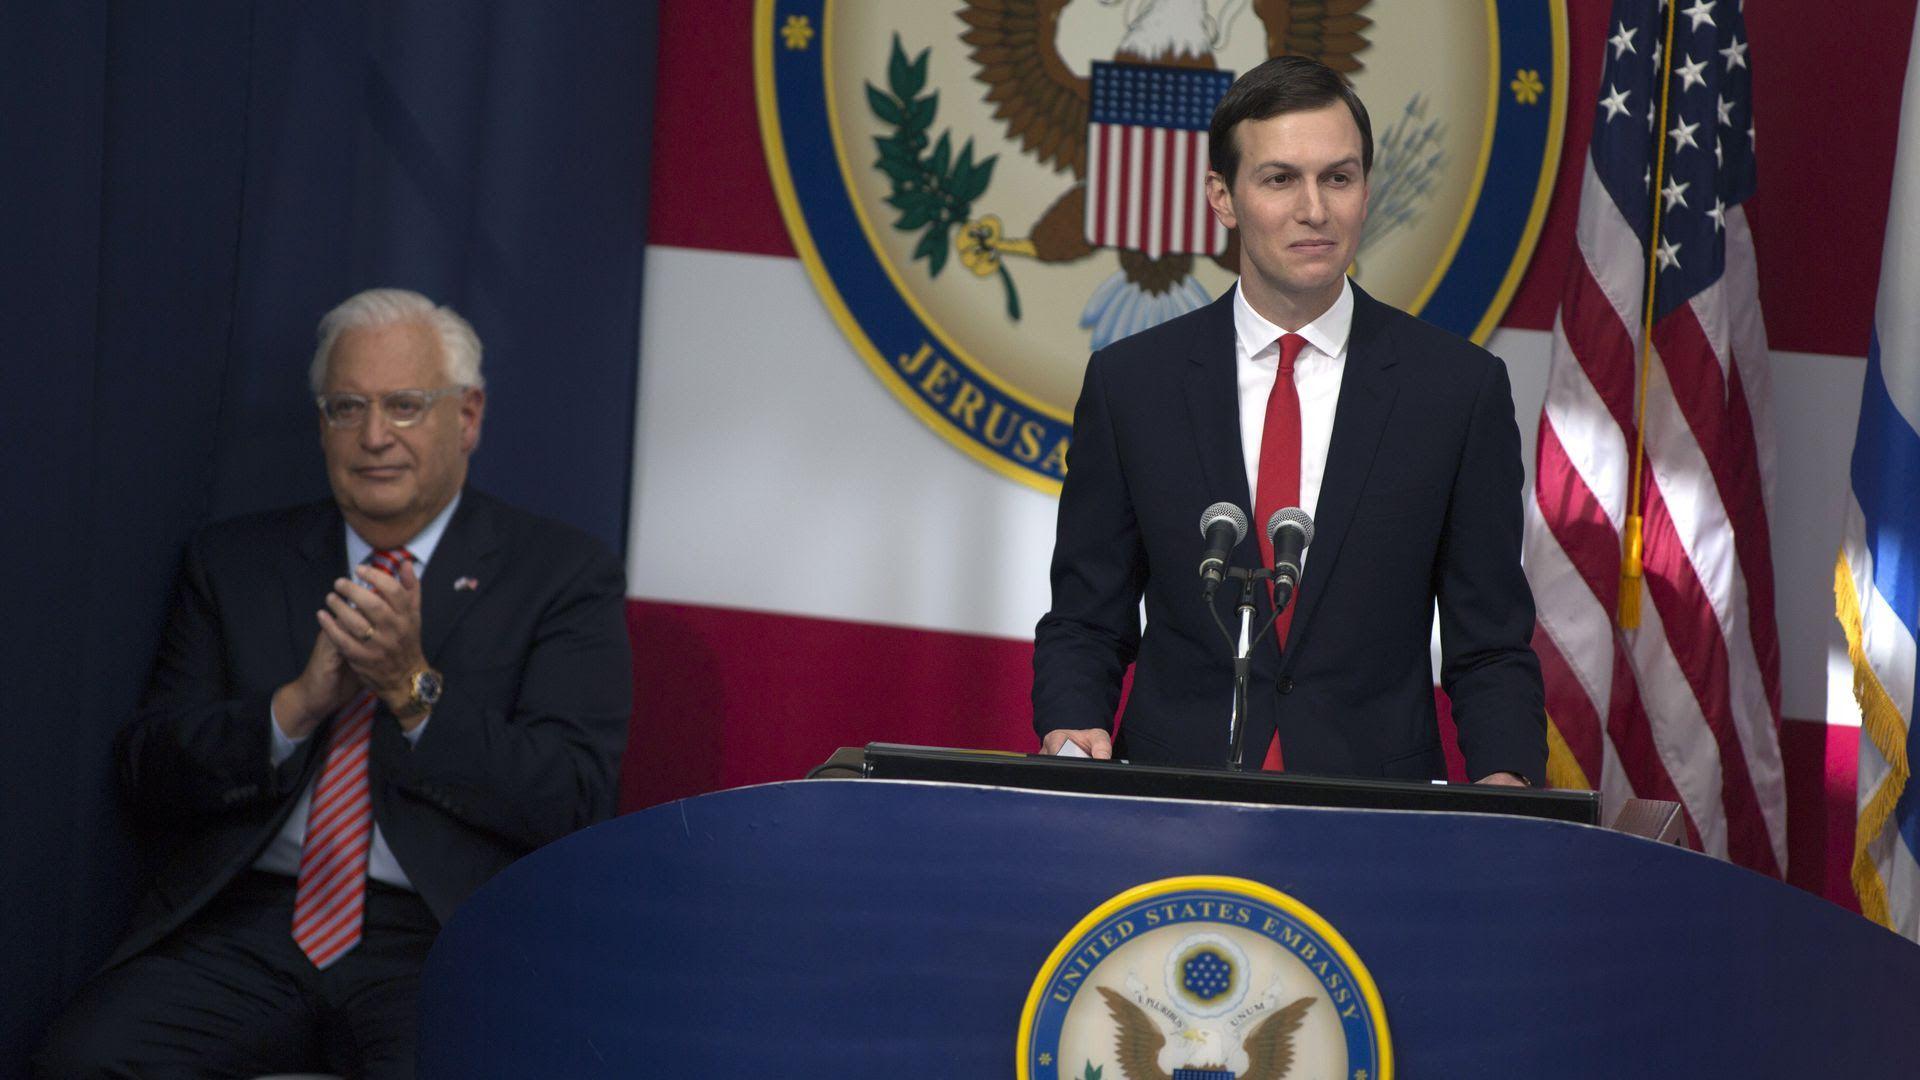 Trump administration set to release details of Jared Kushner's Middle East peace plan